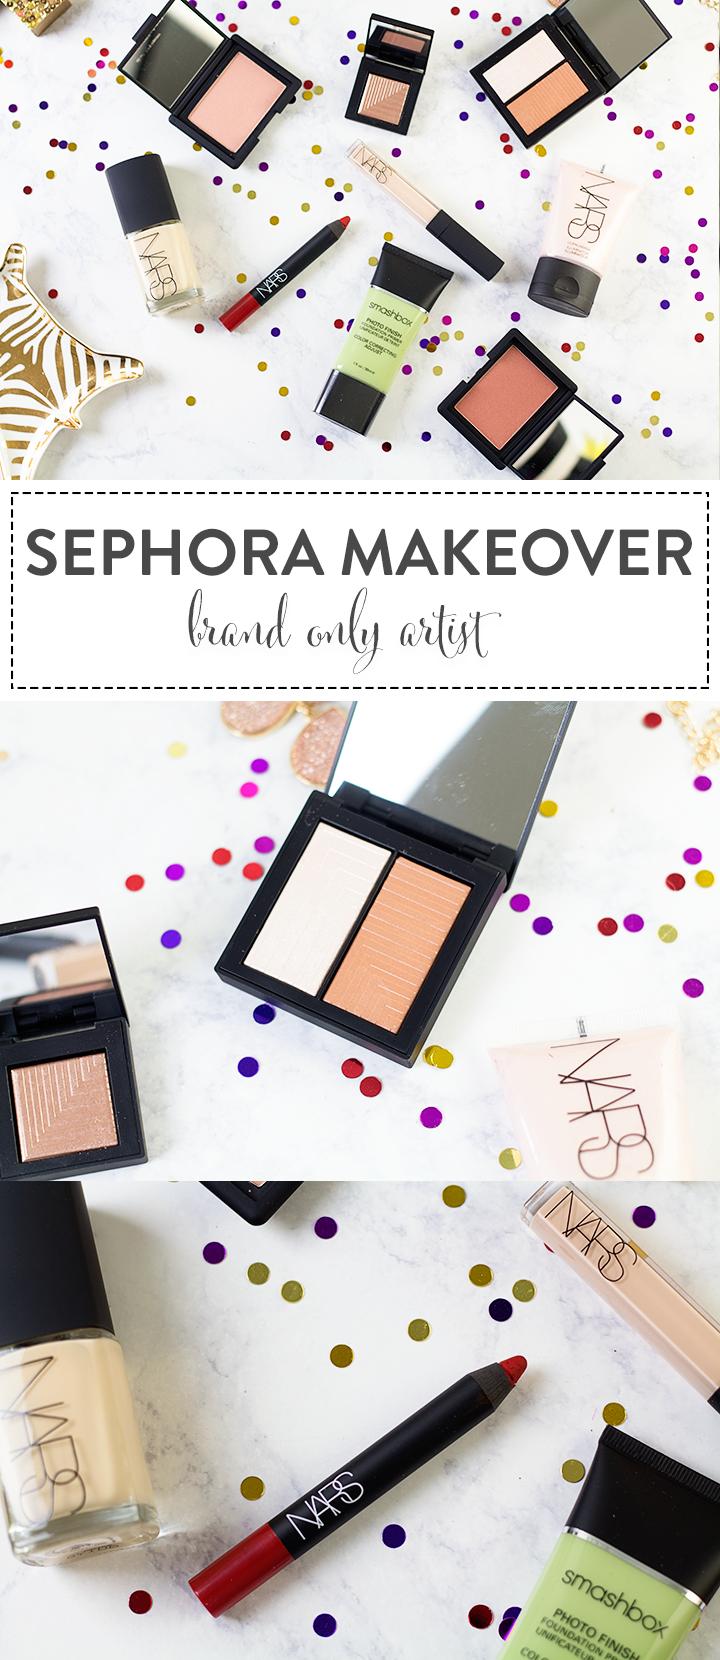 Brand Only Makeup Application at Sephora Sephora